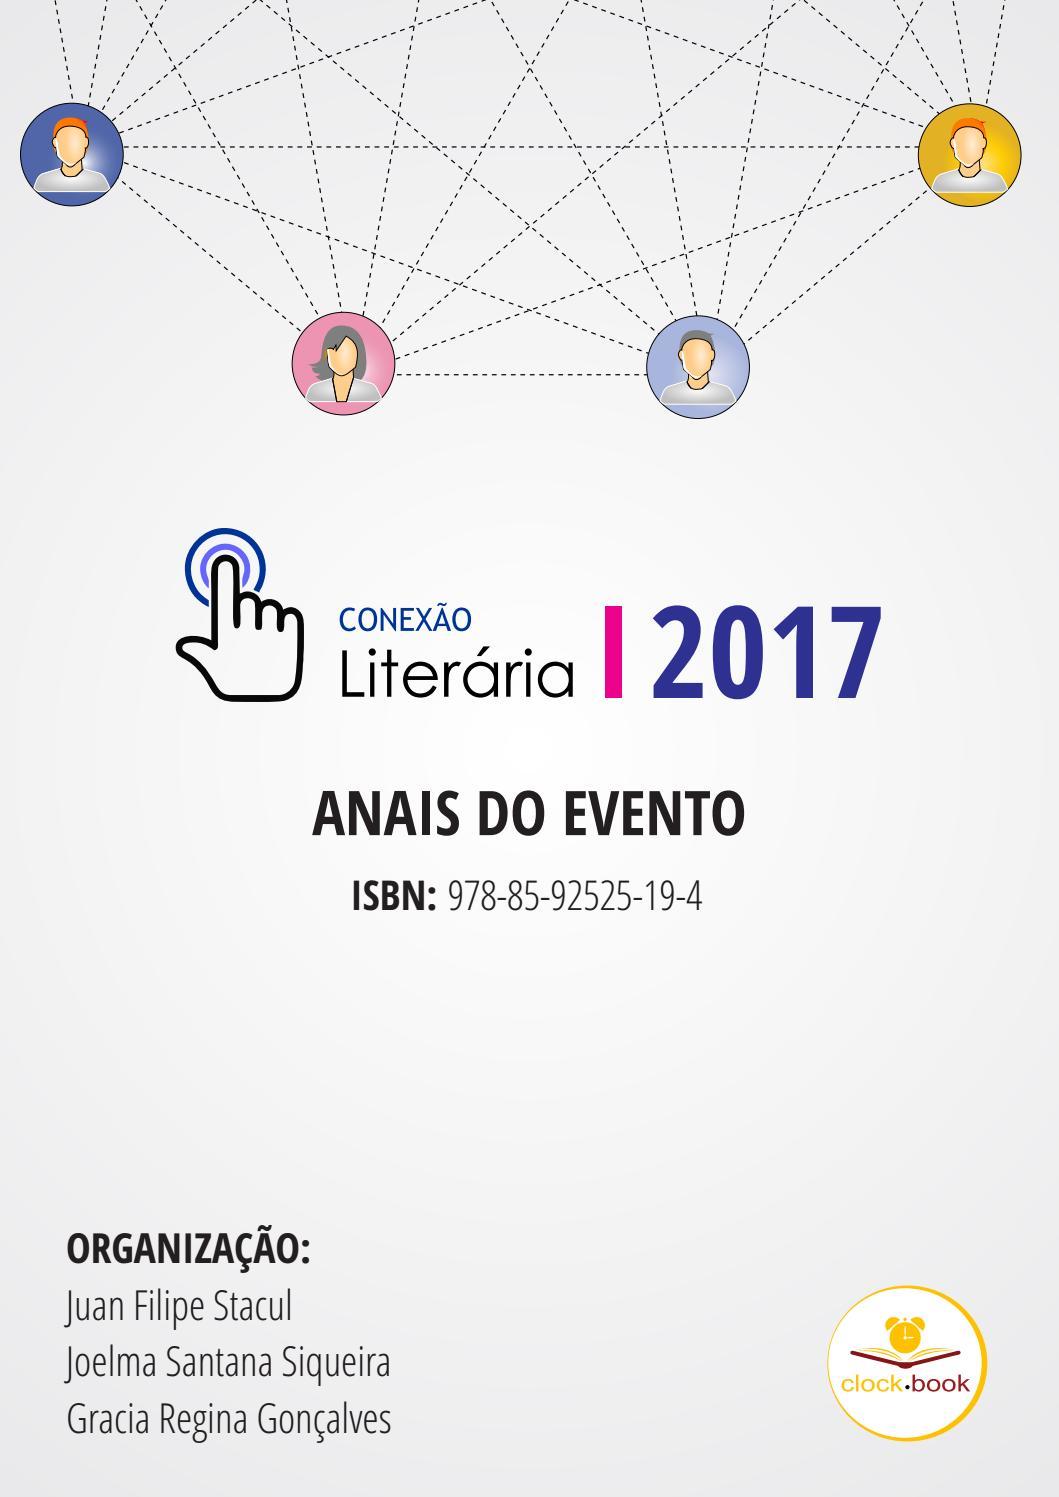 Conexao literria 2017 anais do evento by clock t edies e artes conexao literria 2017 anais do evento by clock t edies e artes issuu fandeluxe Choice Image